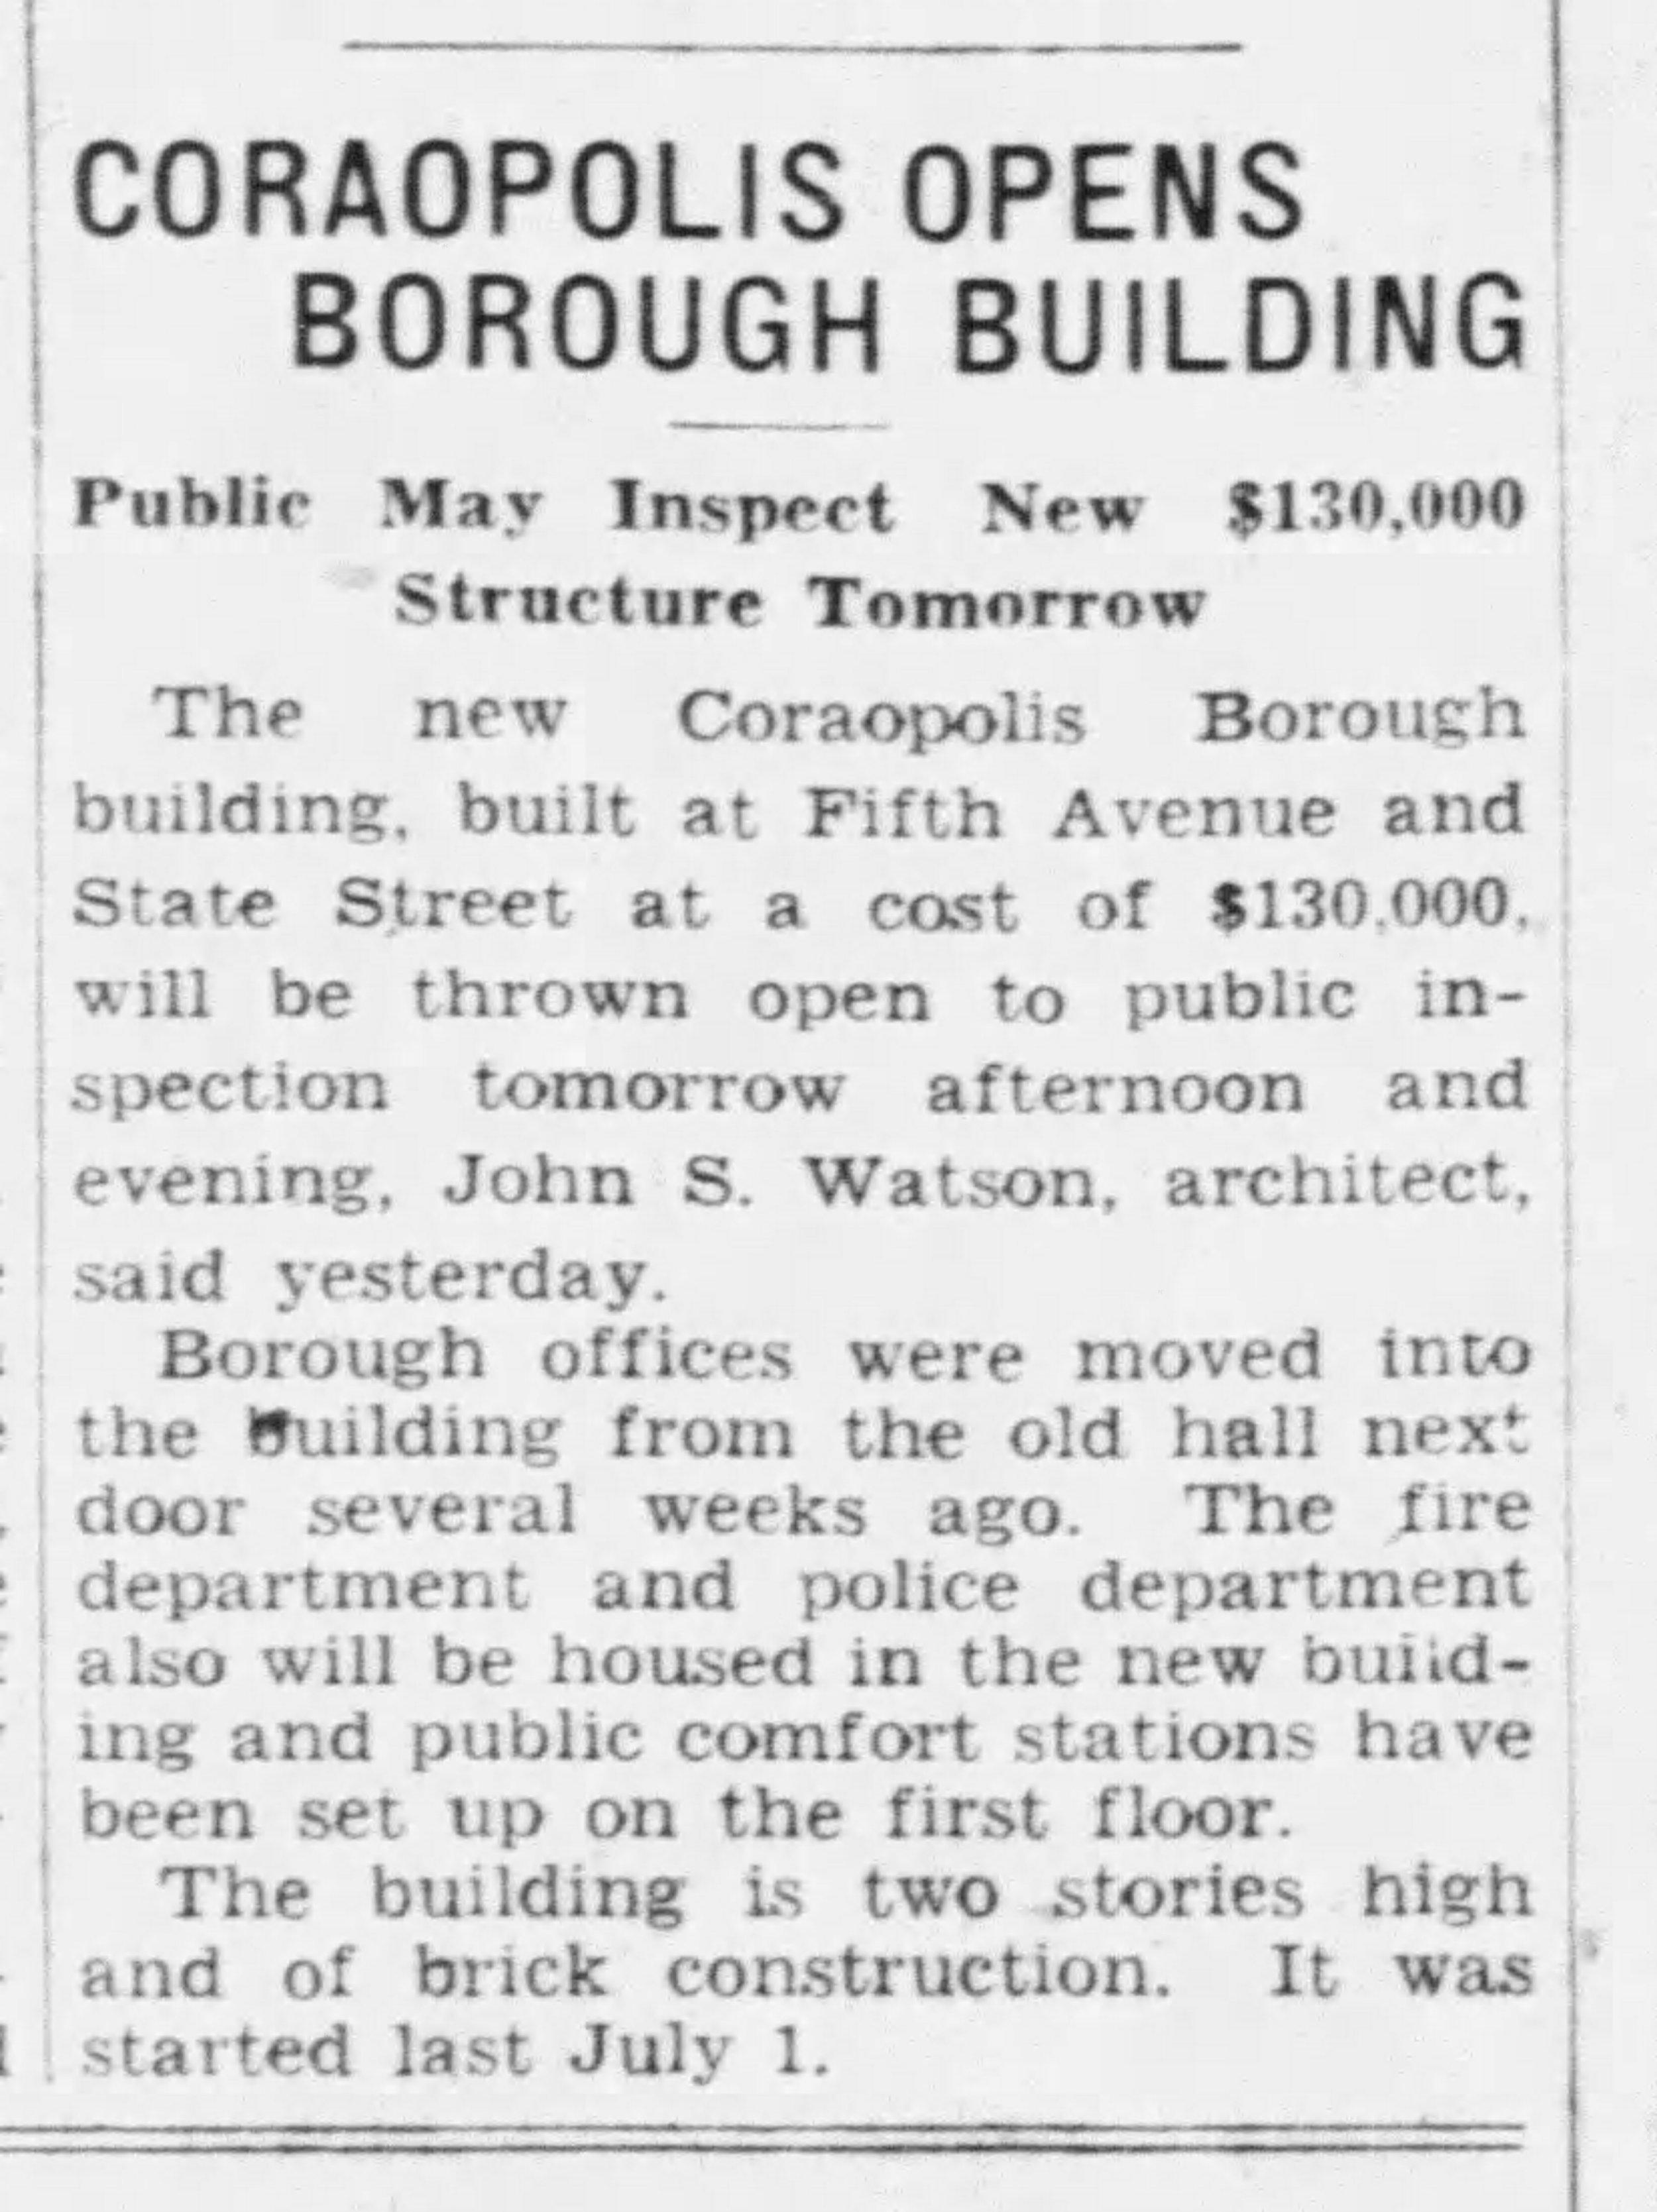 1930-05-23 The Pittsburgh Press (vol XLVI, n332, p6)